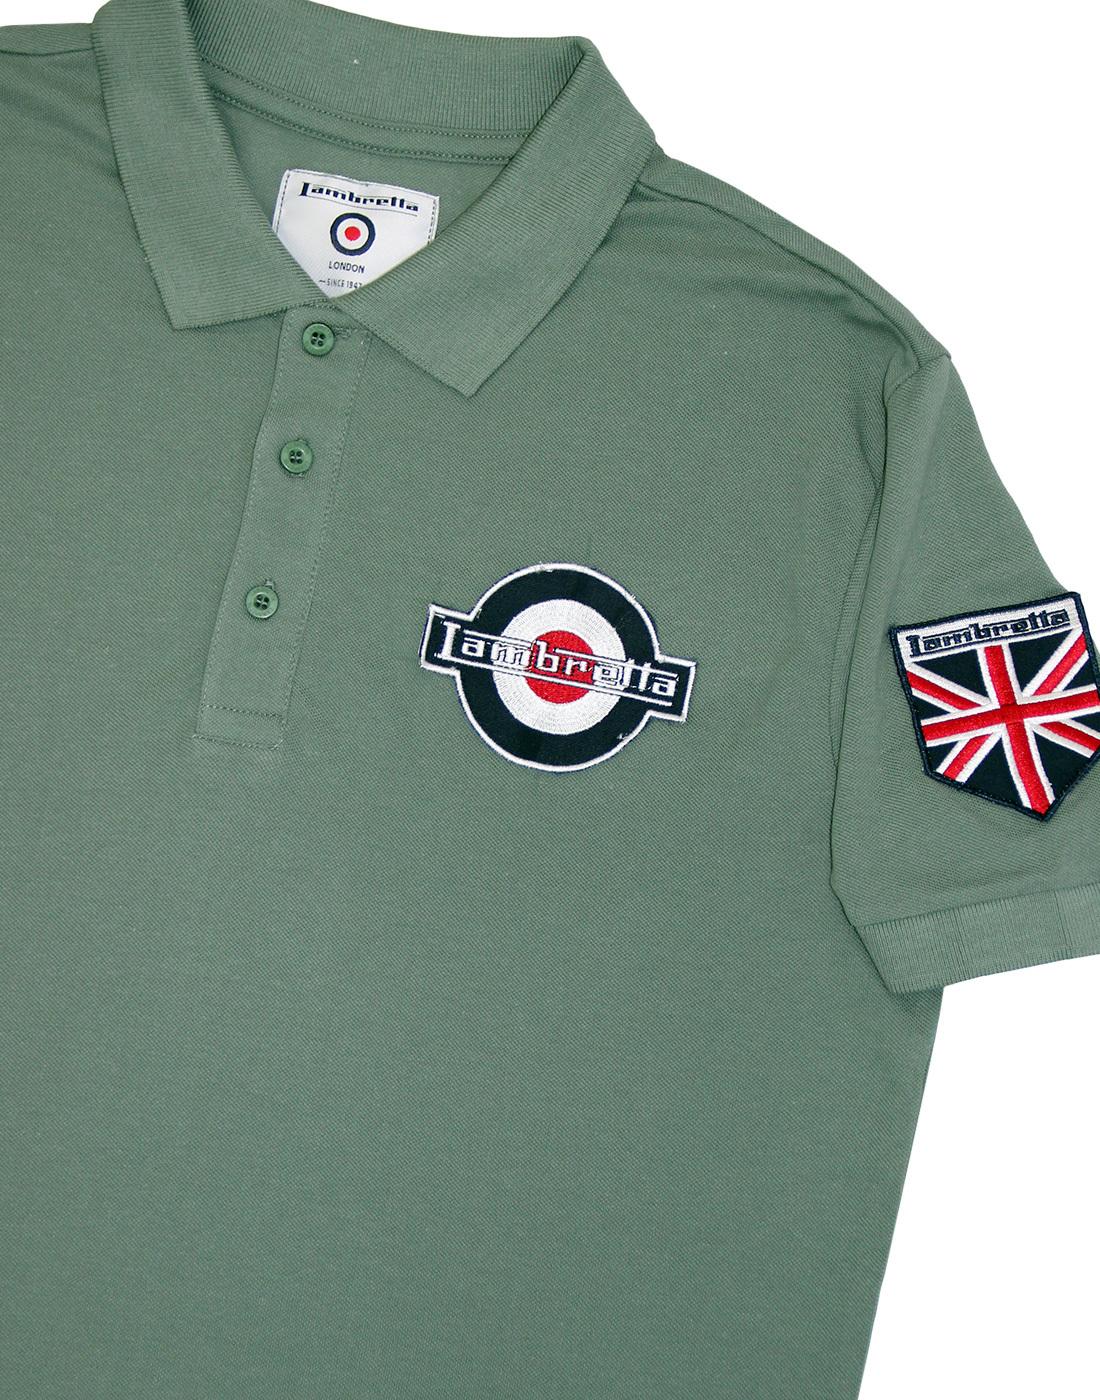 Lambretta Khaki 100/% Cotton 2 Badge Polo Shirts …